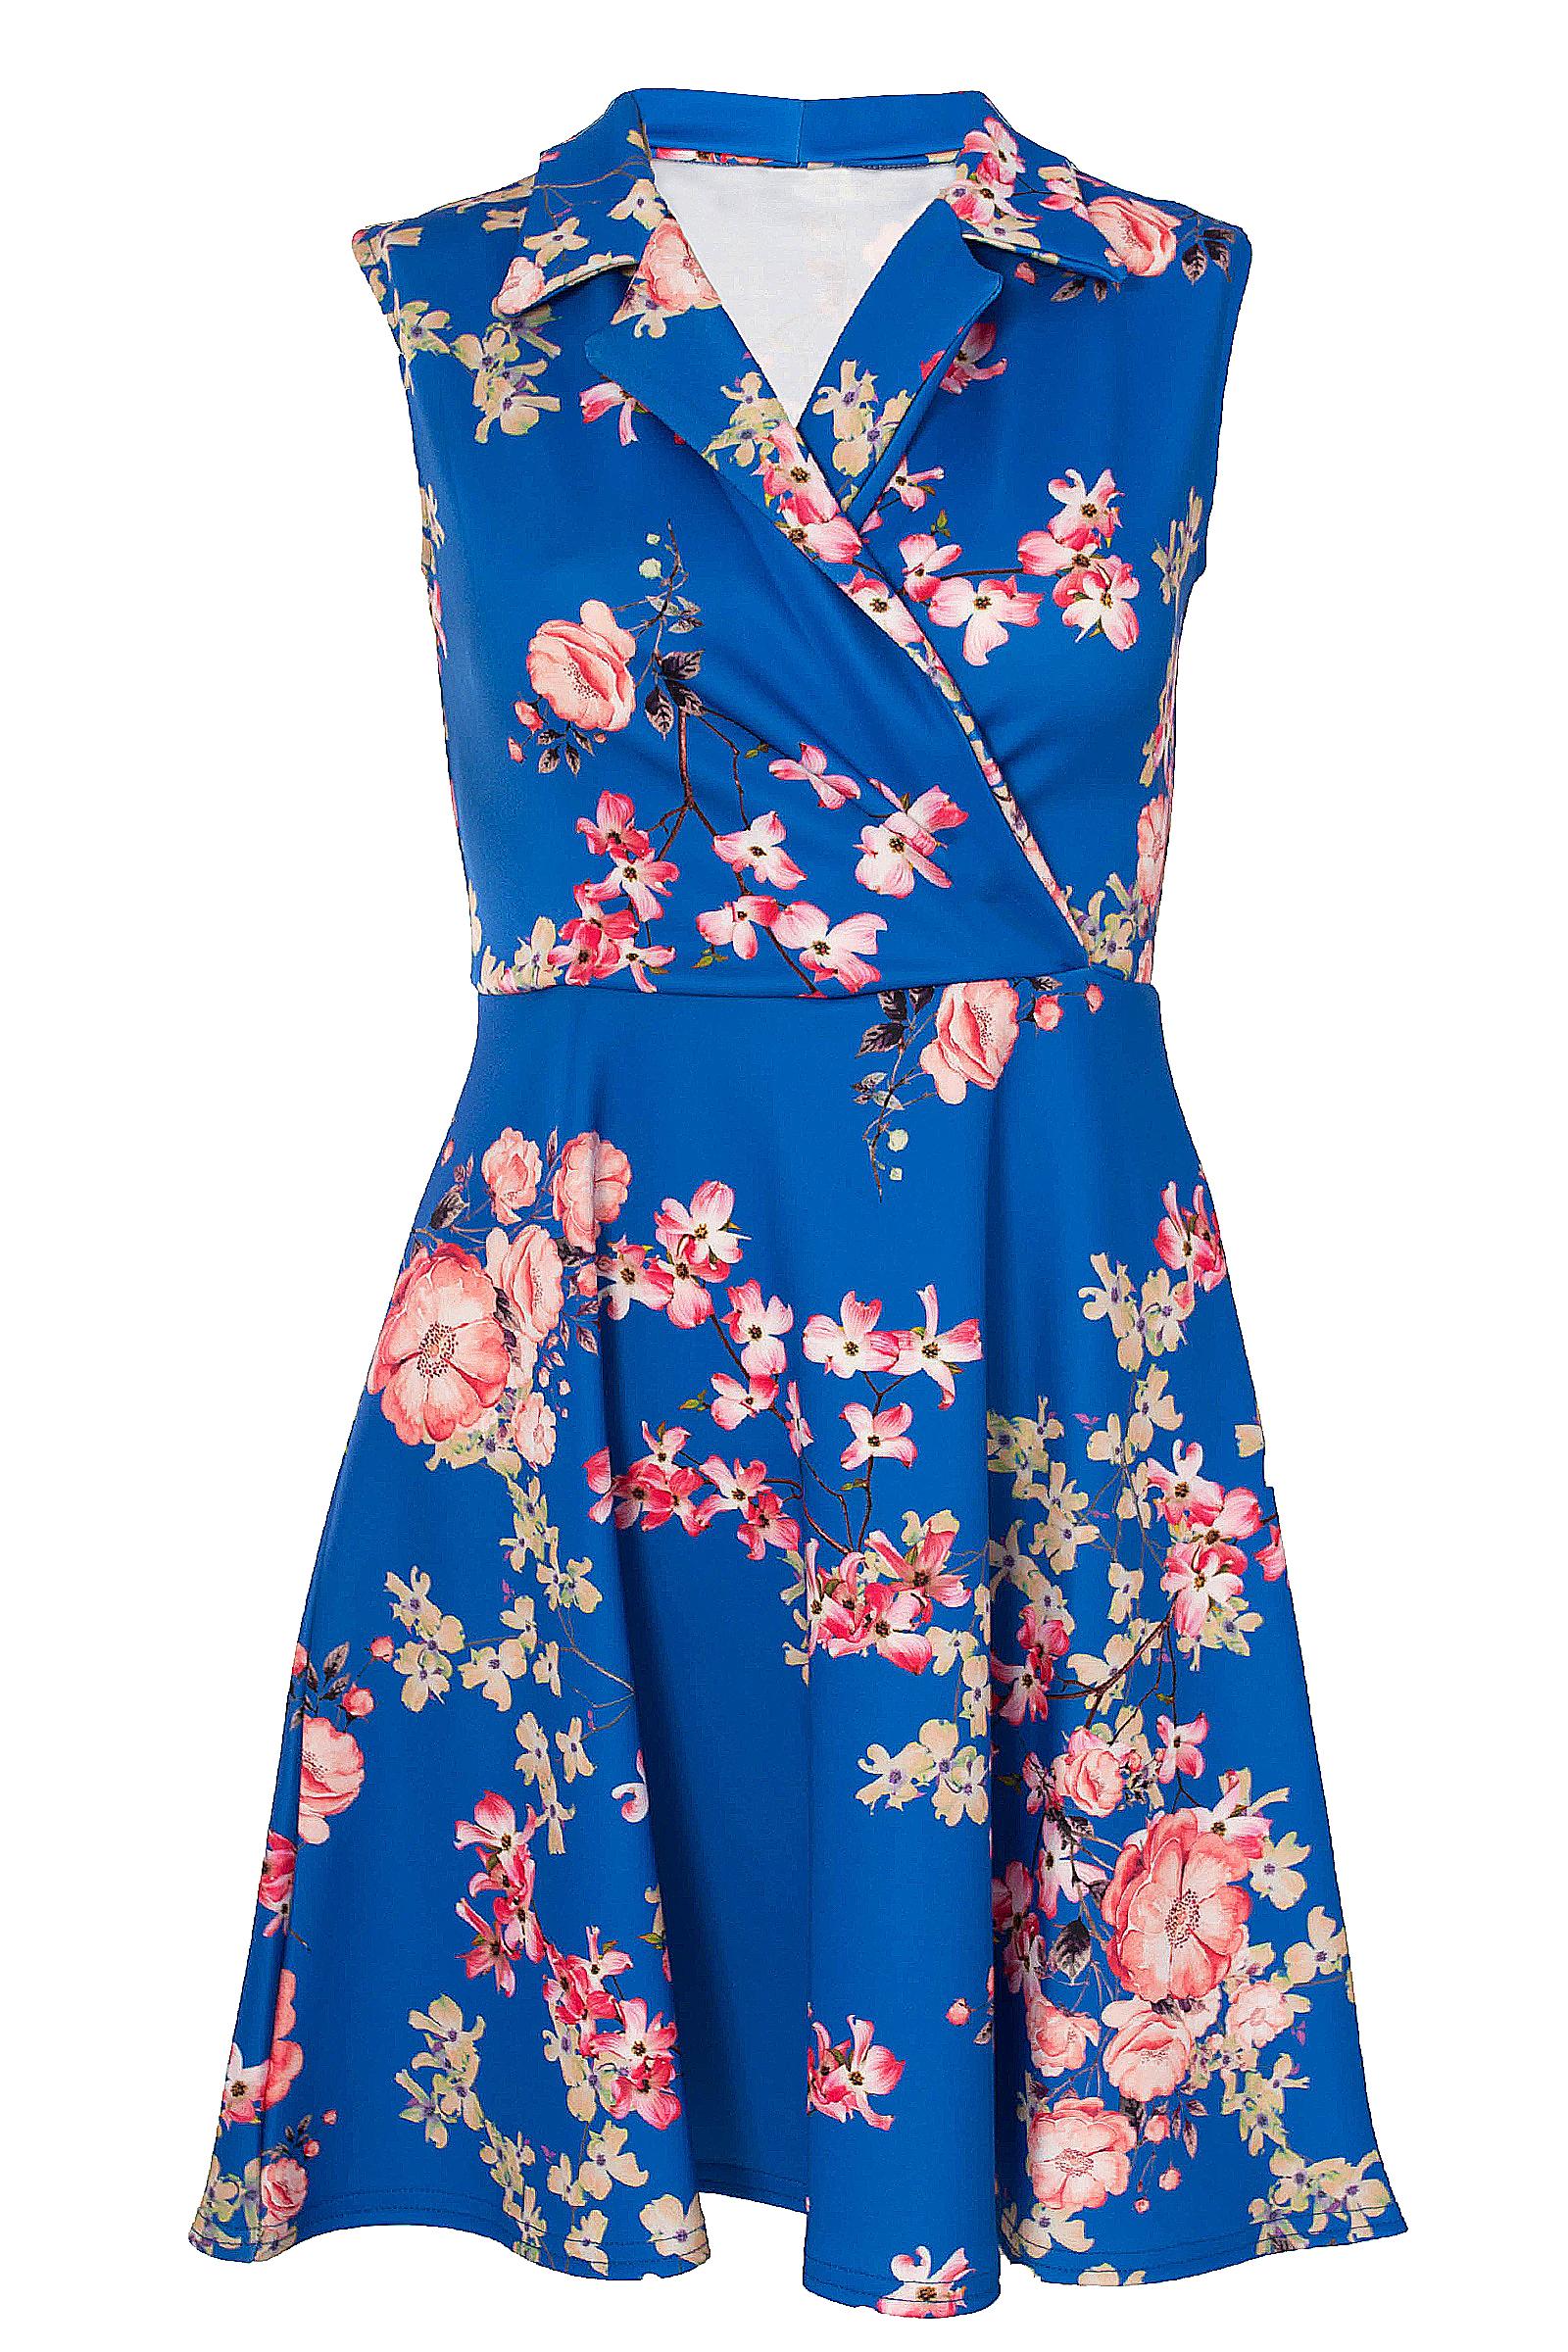 Royal Blue Floral Sleeveless Swing Dress